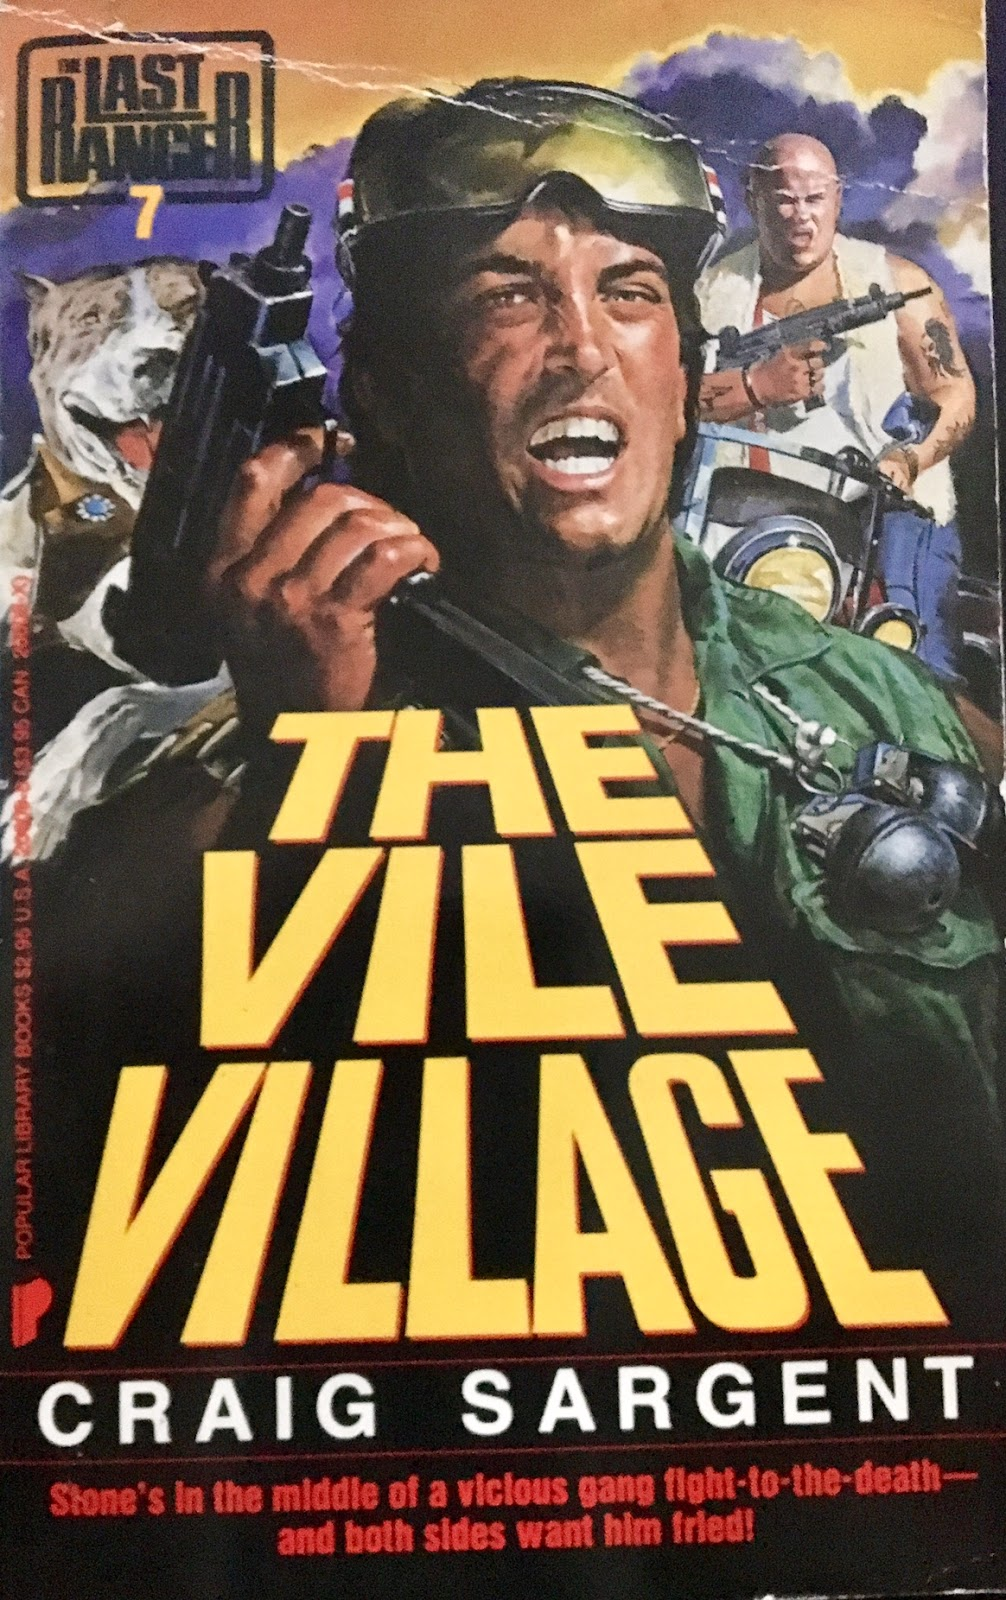 Last Ranger 07 - The Vile Village